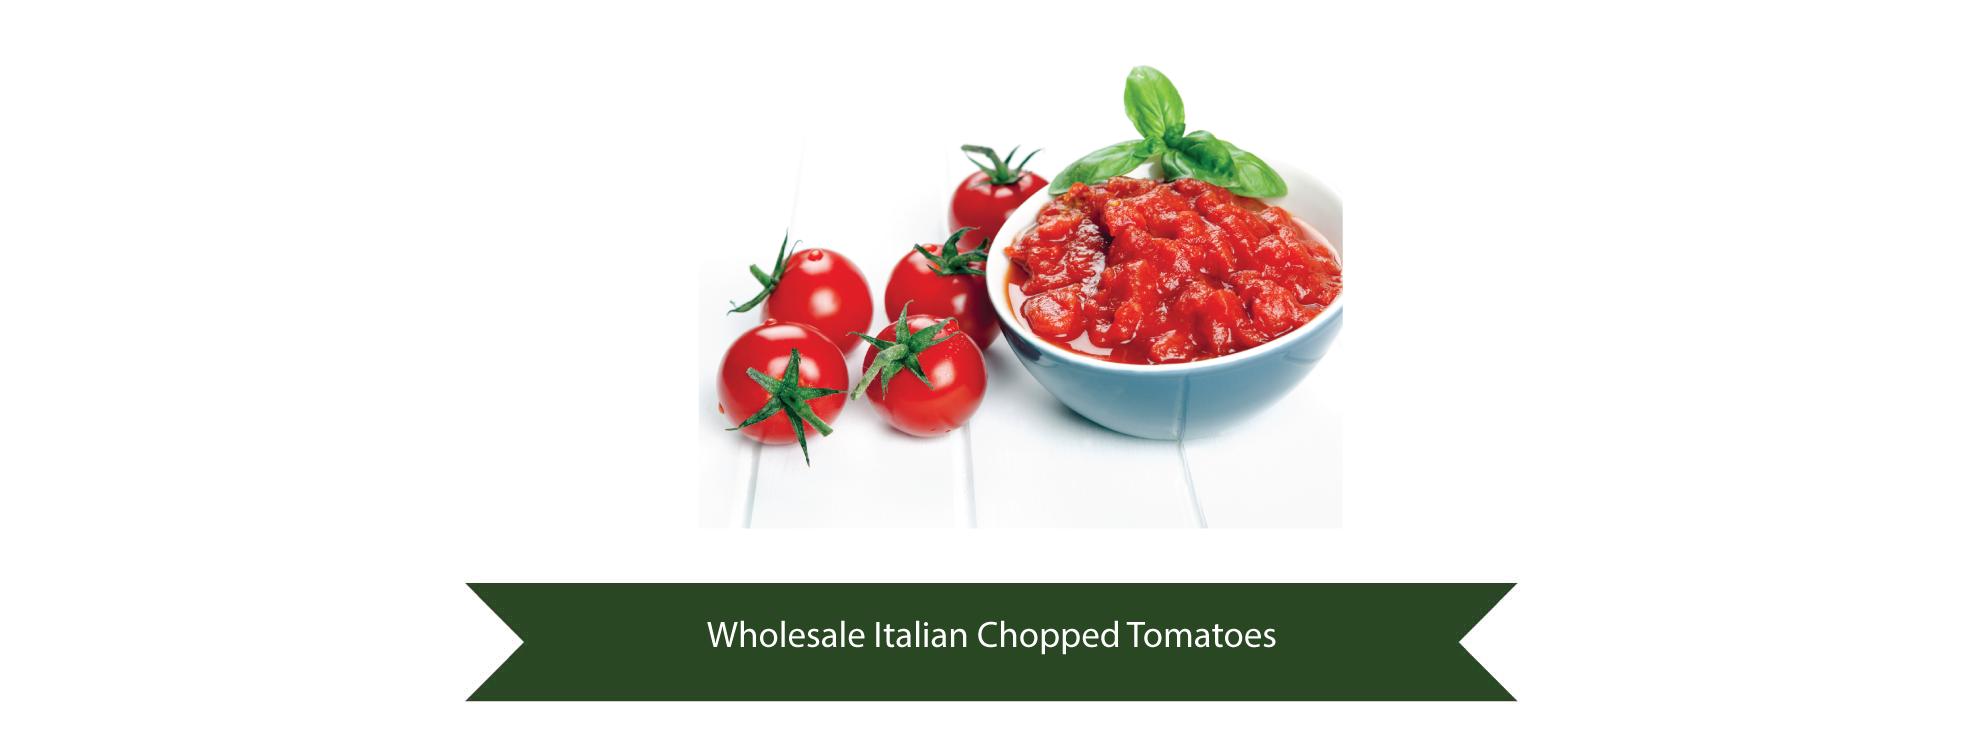 Wholesale-Italian-Chopped-Tomatoes